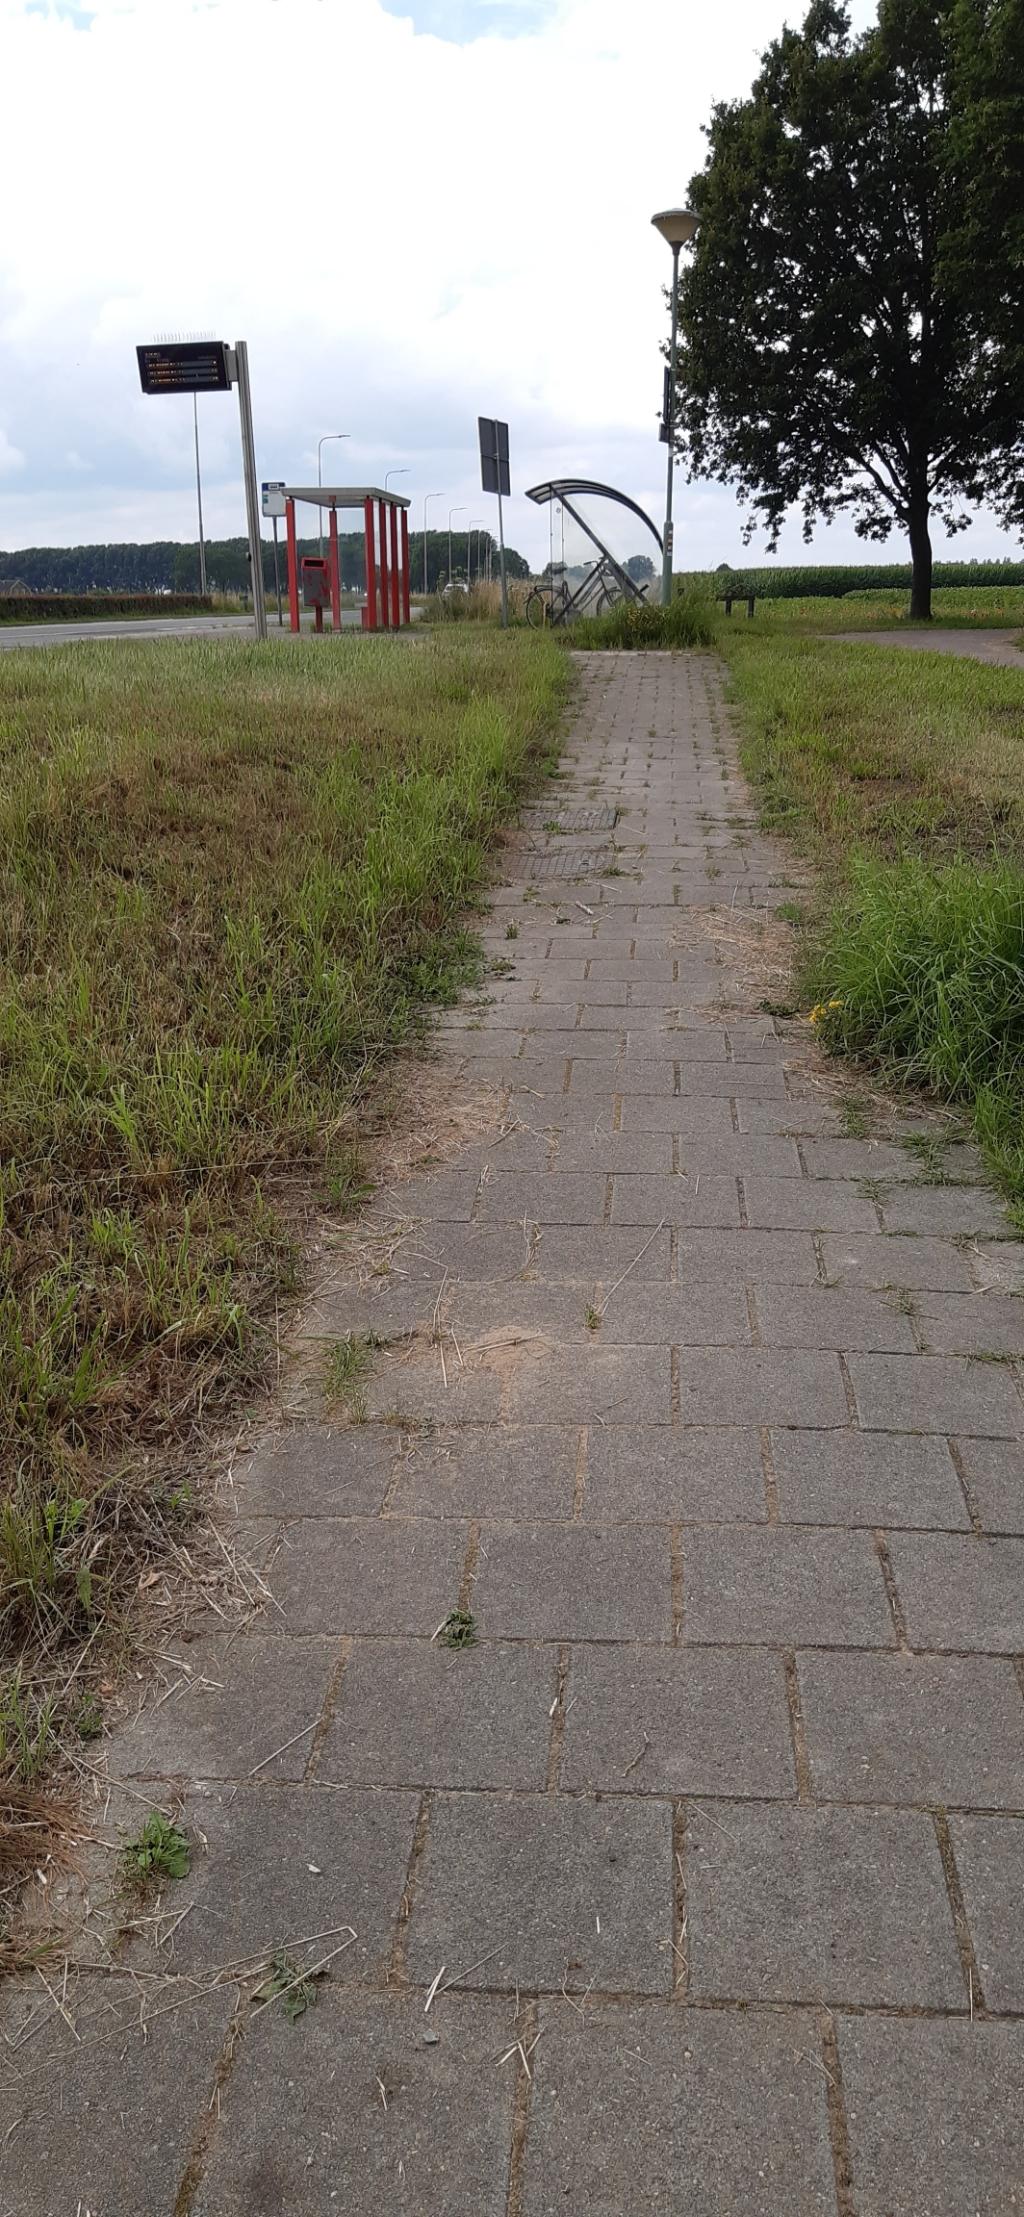 Ook dit pad tussen tunnel en bushalte kan verbetering gebruiken Kuun Jenniskens © BDU media